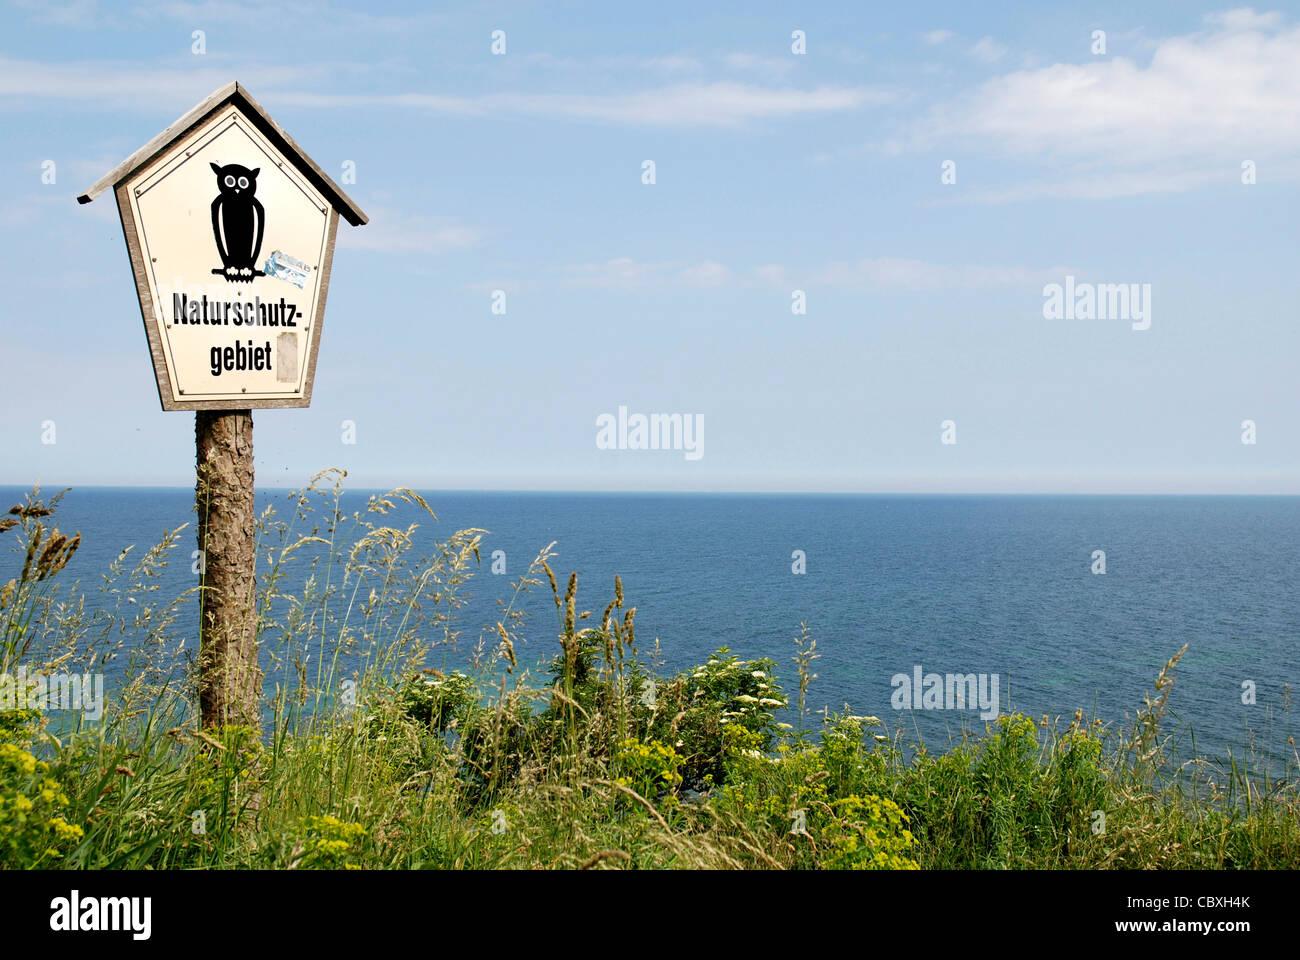 Kap Arkona-Naturschutzgebiet auf der Insel Rügen. Stockbild